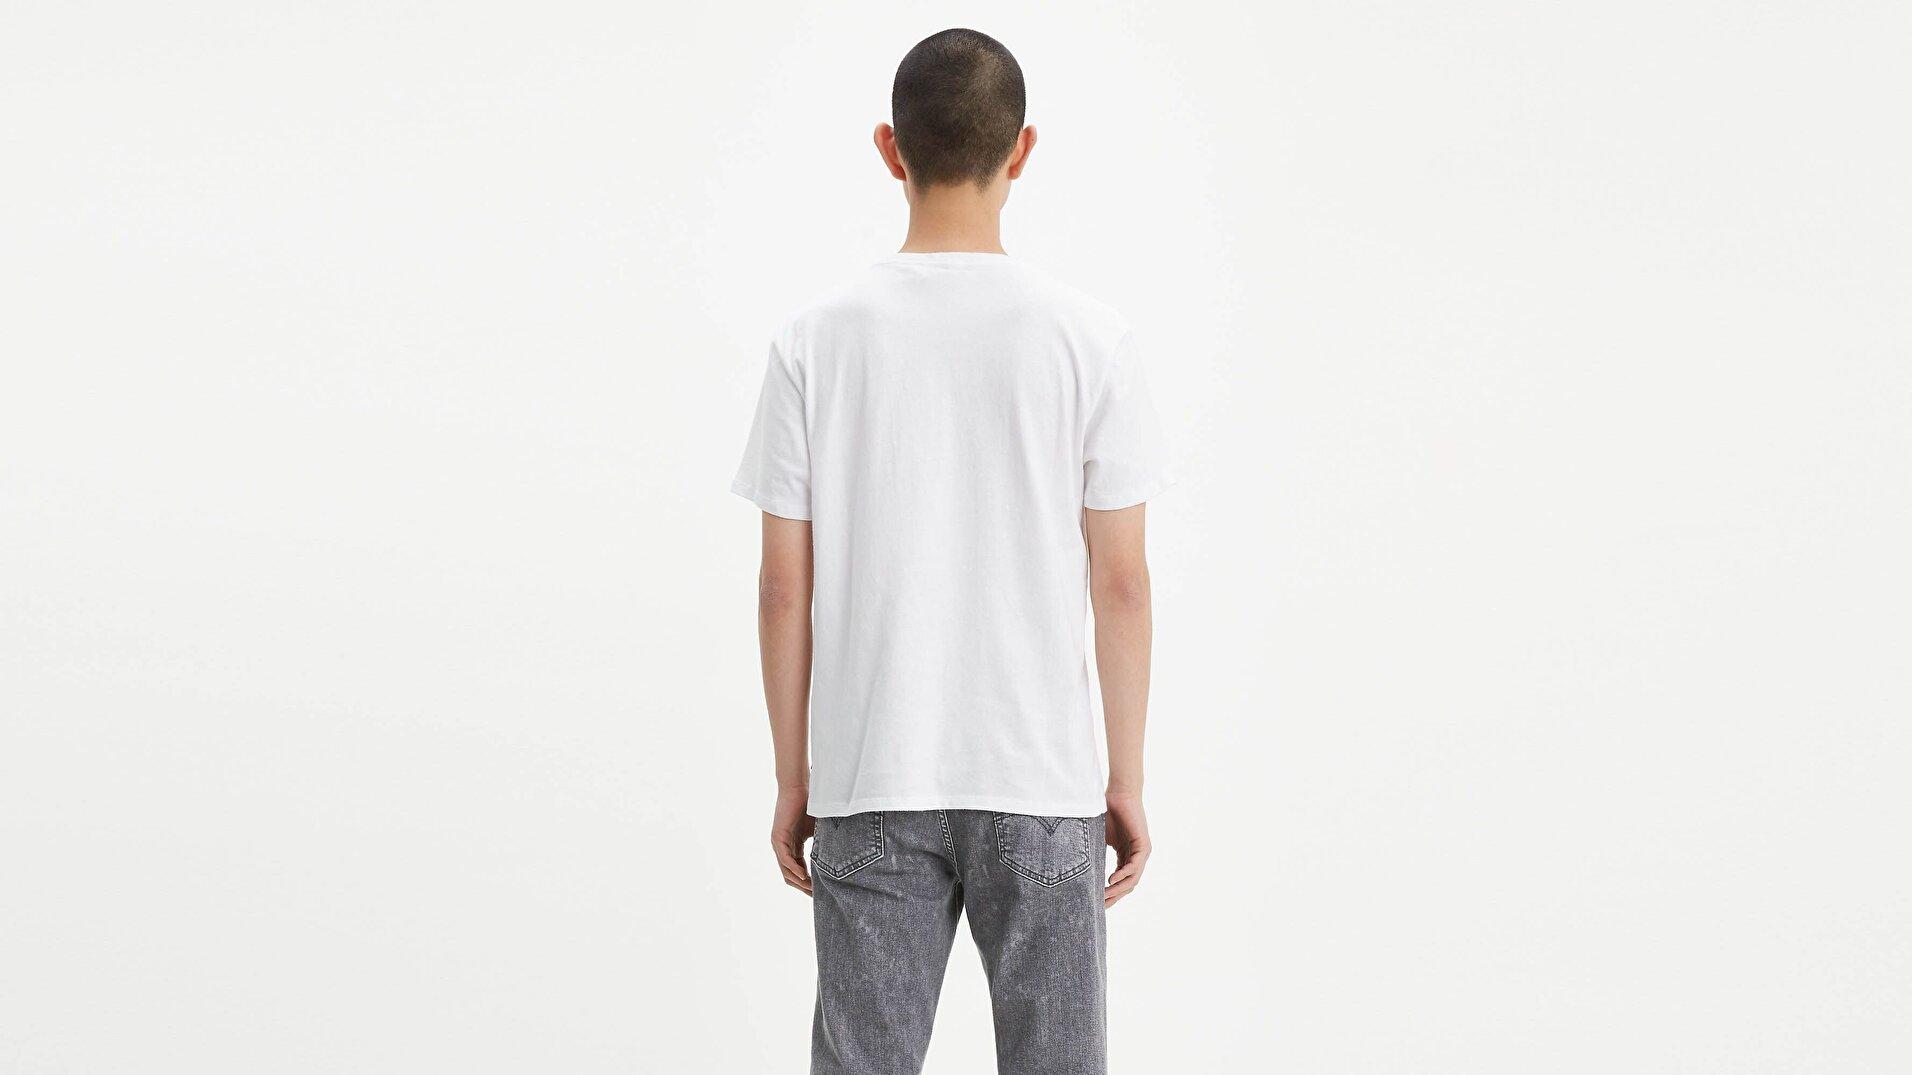 Graphic Set-In Neck Hm Graphic Beyaz Erkek Tişört